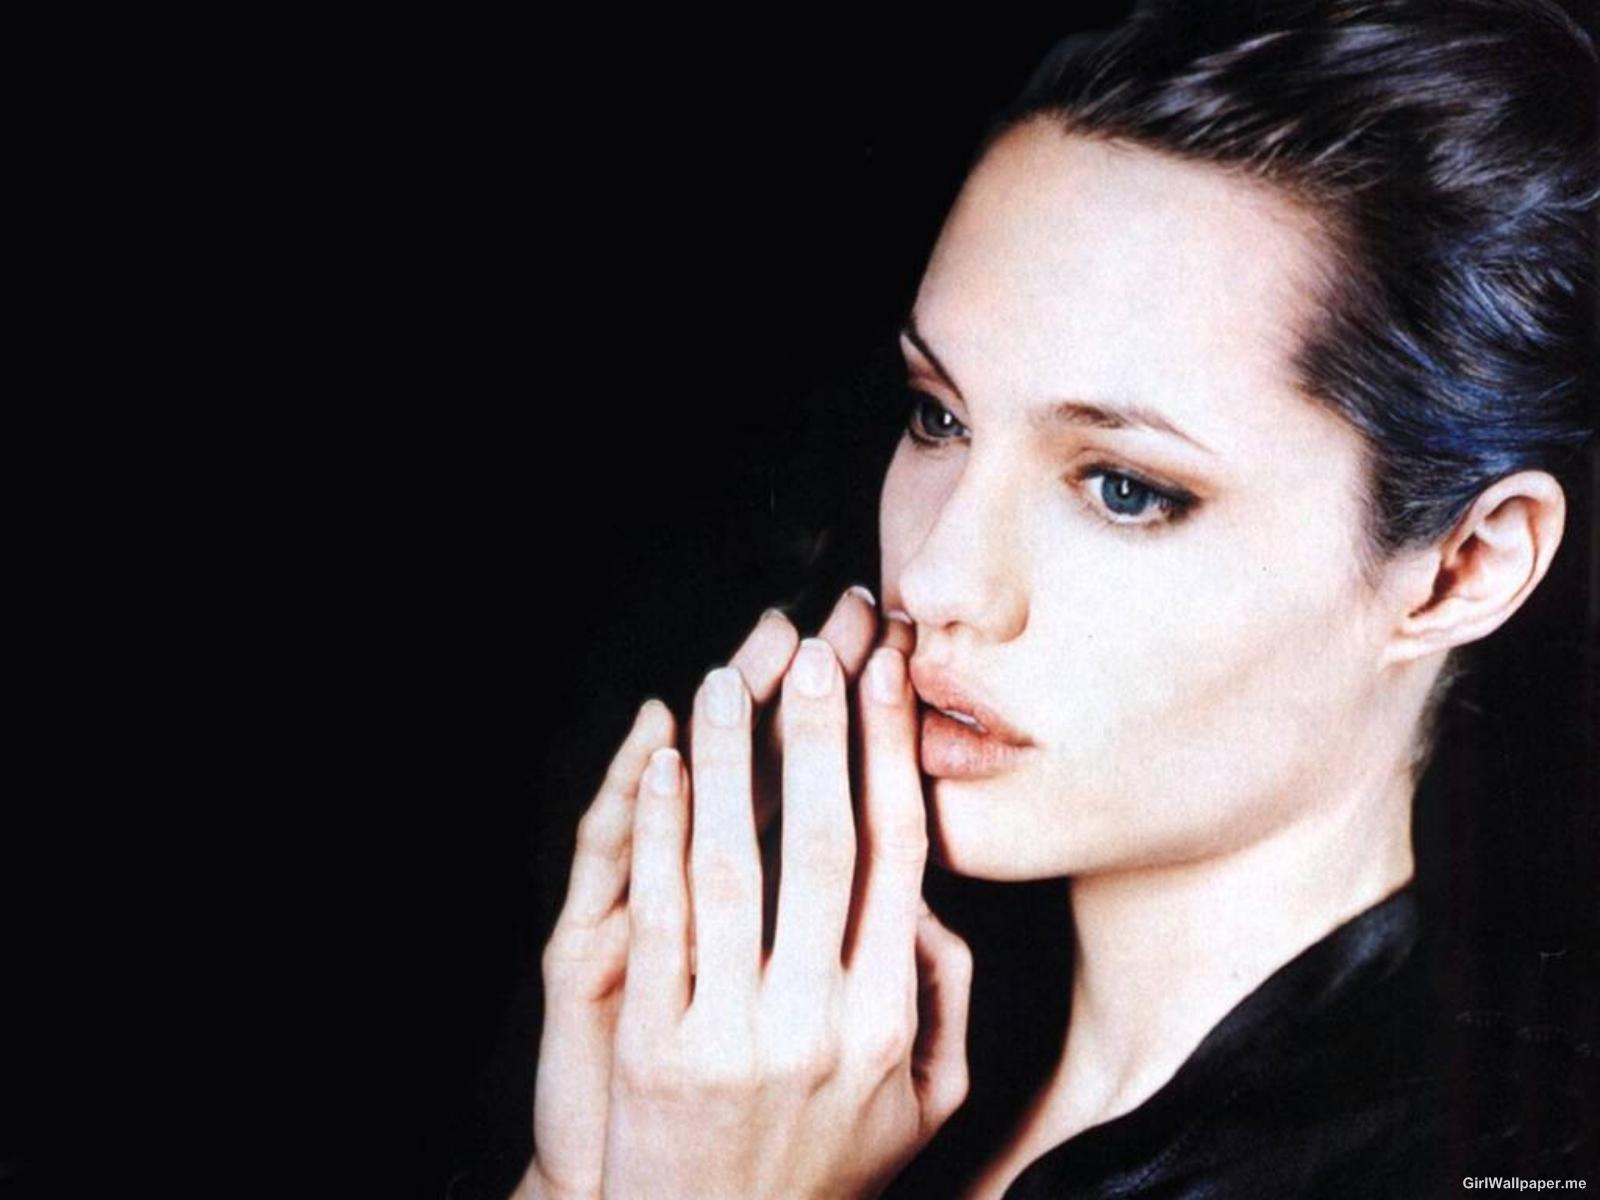 http://4.bp.blogspot.com/-qA8oq1hIgTo/TbW4gEoUkNI/AAAAAAAANzI/iChAZRRyKQk/s1600/Angelina_Jolie_sexy_wallpaper%2B%25283%2529.jpg